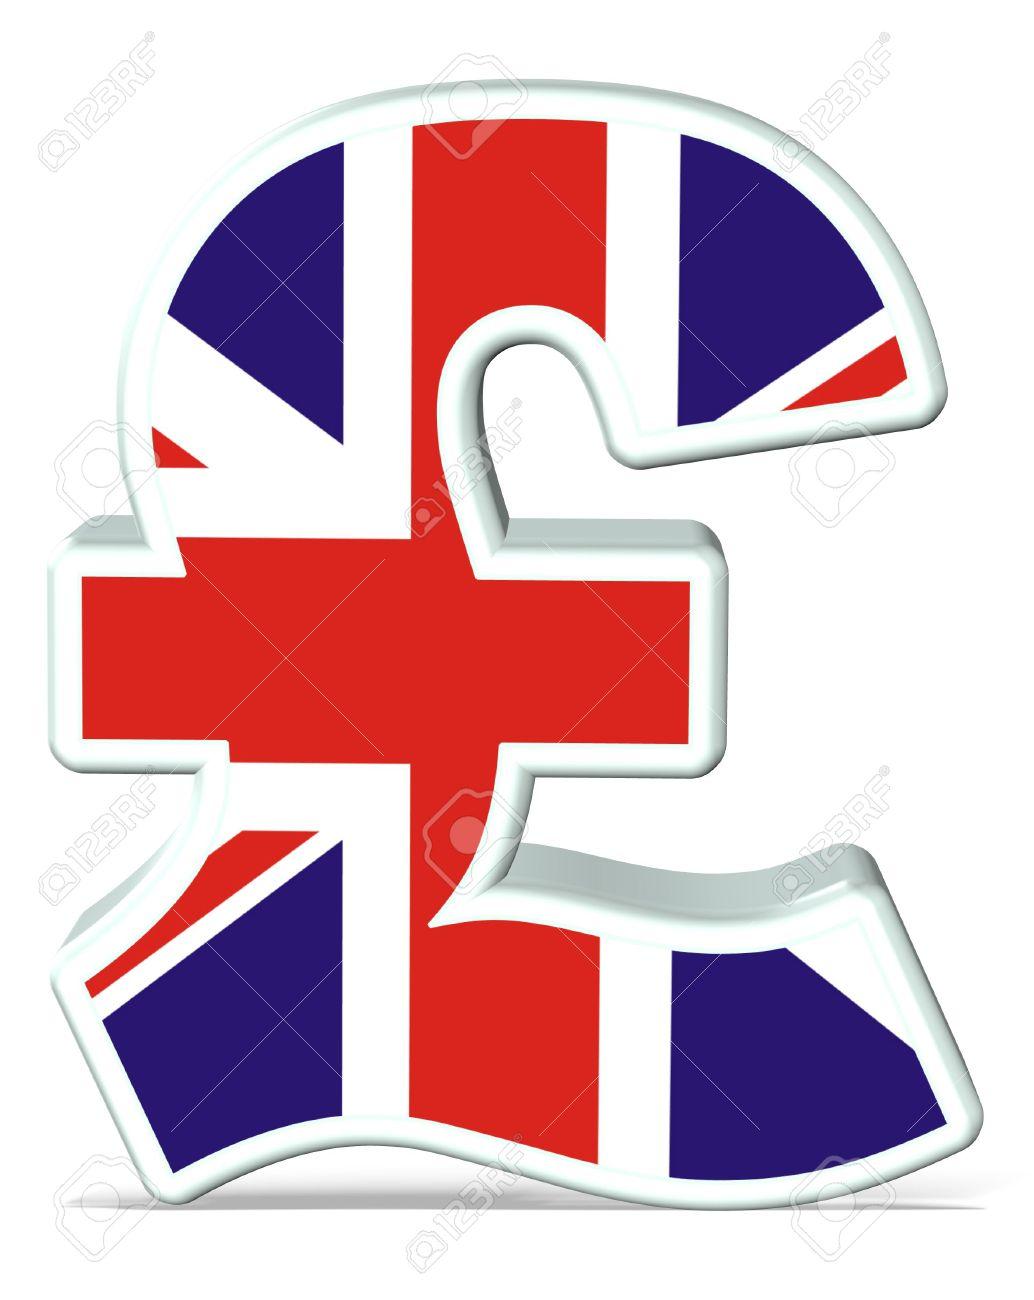 3d british pound sterling with union jack flag stock photo 3d british pound sterling with union jack flag stock photo 5486163 buycottarizona